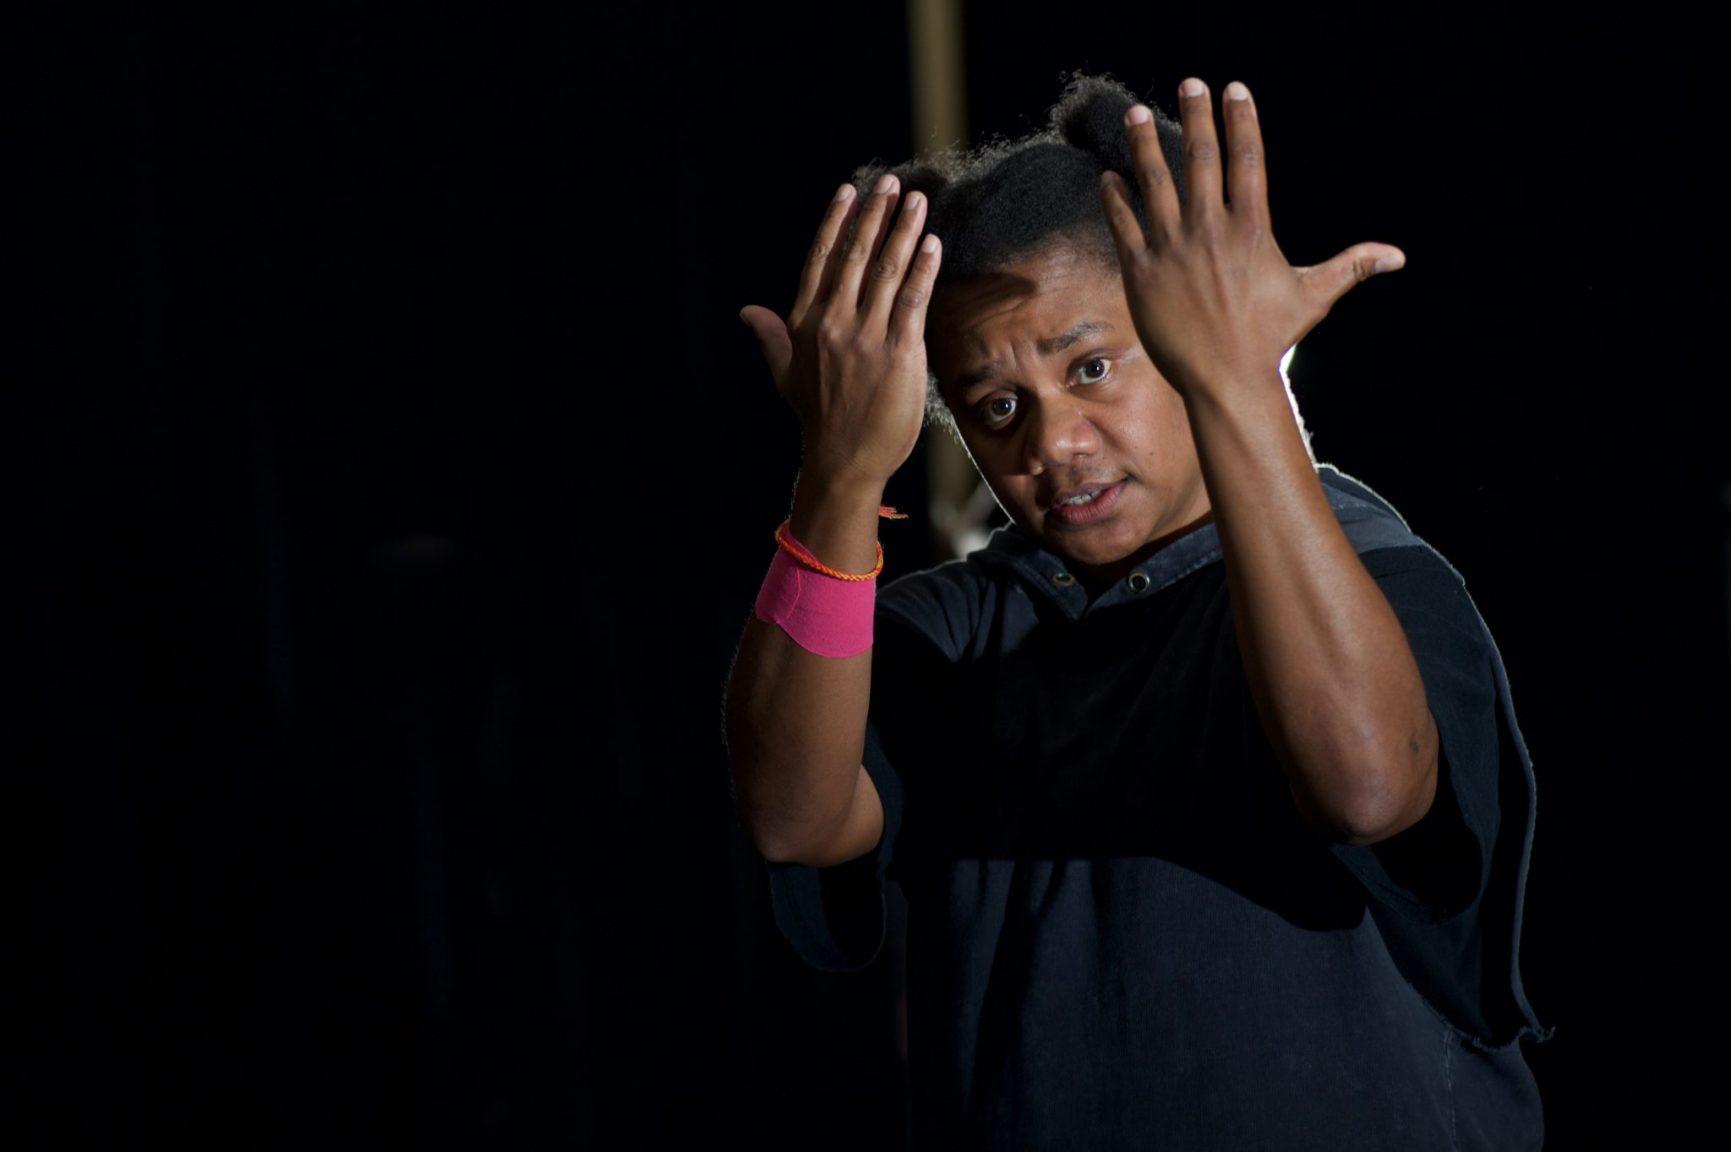 Lak Maluwal Paru, In Development, Contemporary Dance, Carriageworks